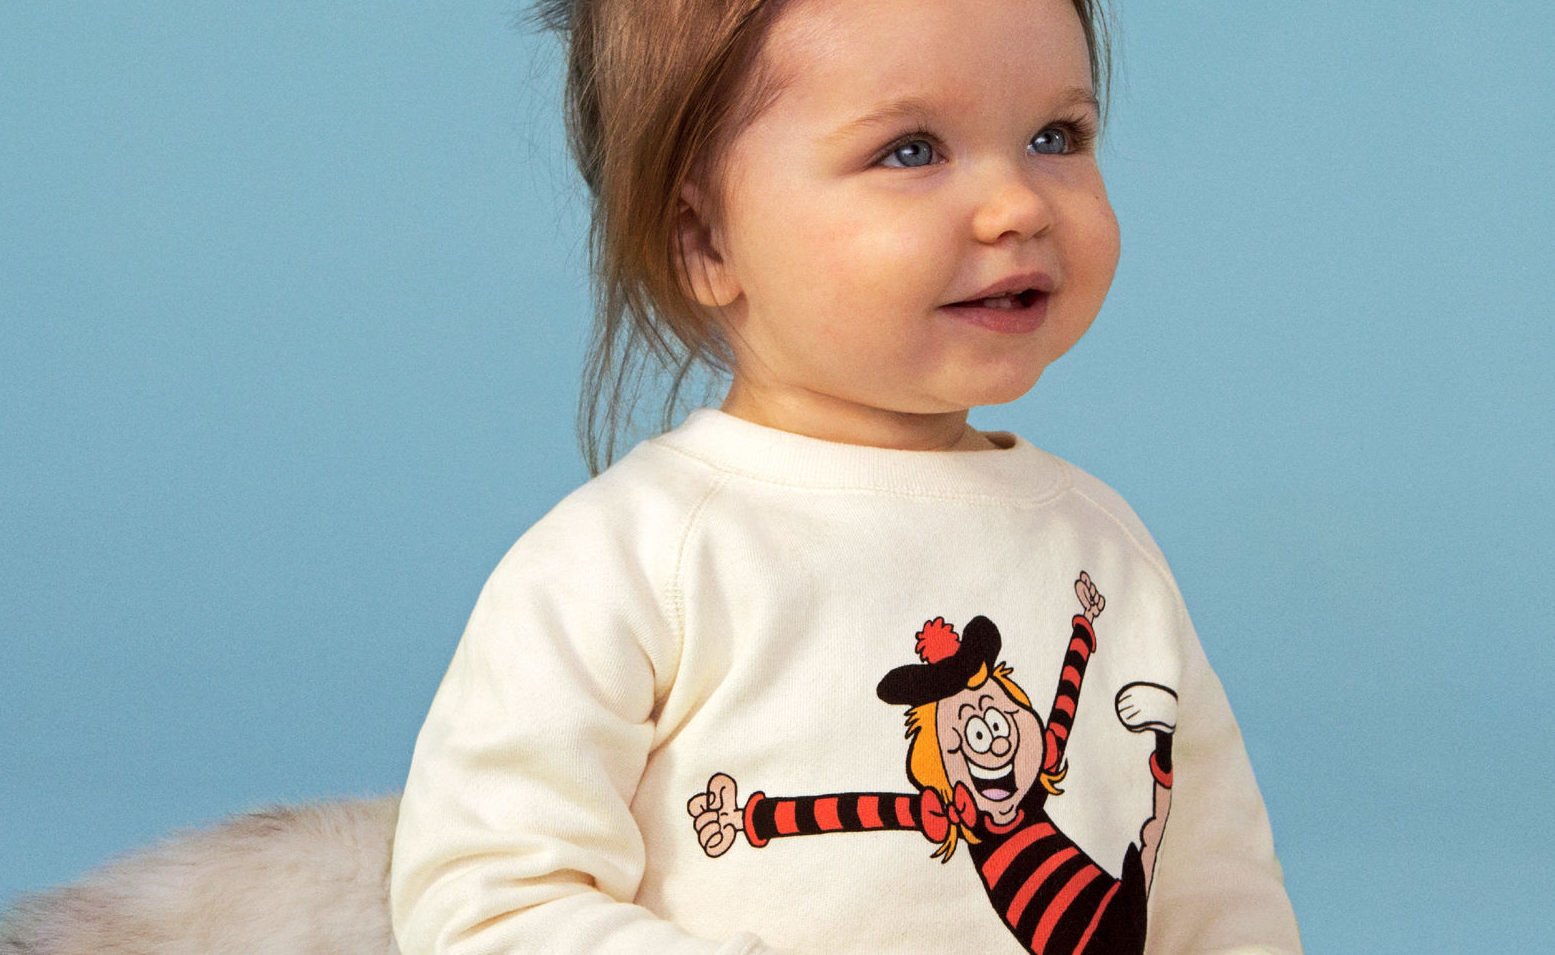 18-month-old Ava wearing the new Beano X Stella McCartney kid clothing range (Stella McCartney/Beano Studios /PA Wire)